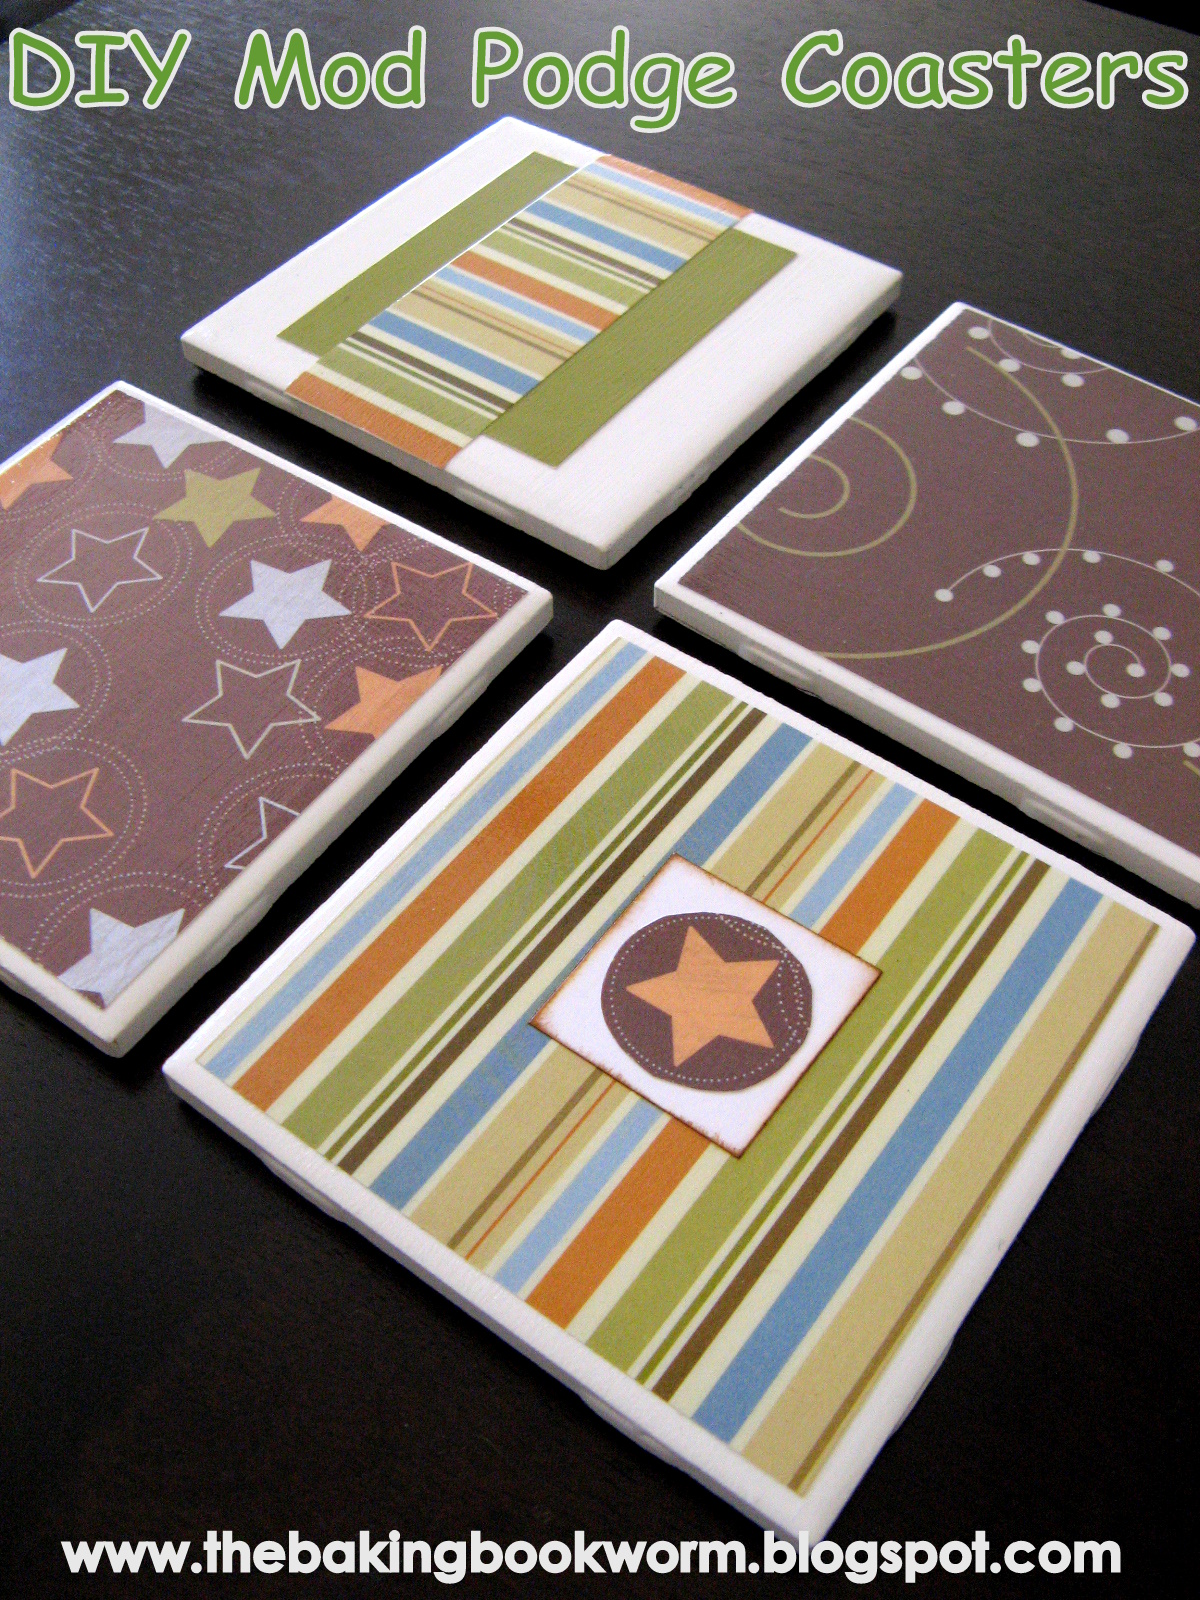 The baking bookworm diy mod podge coasters for Diy using mod podge